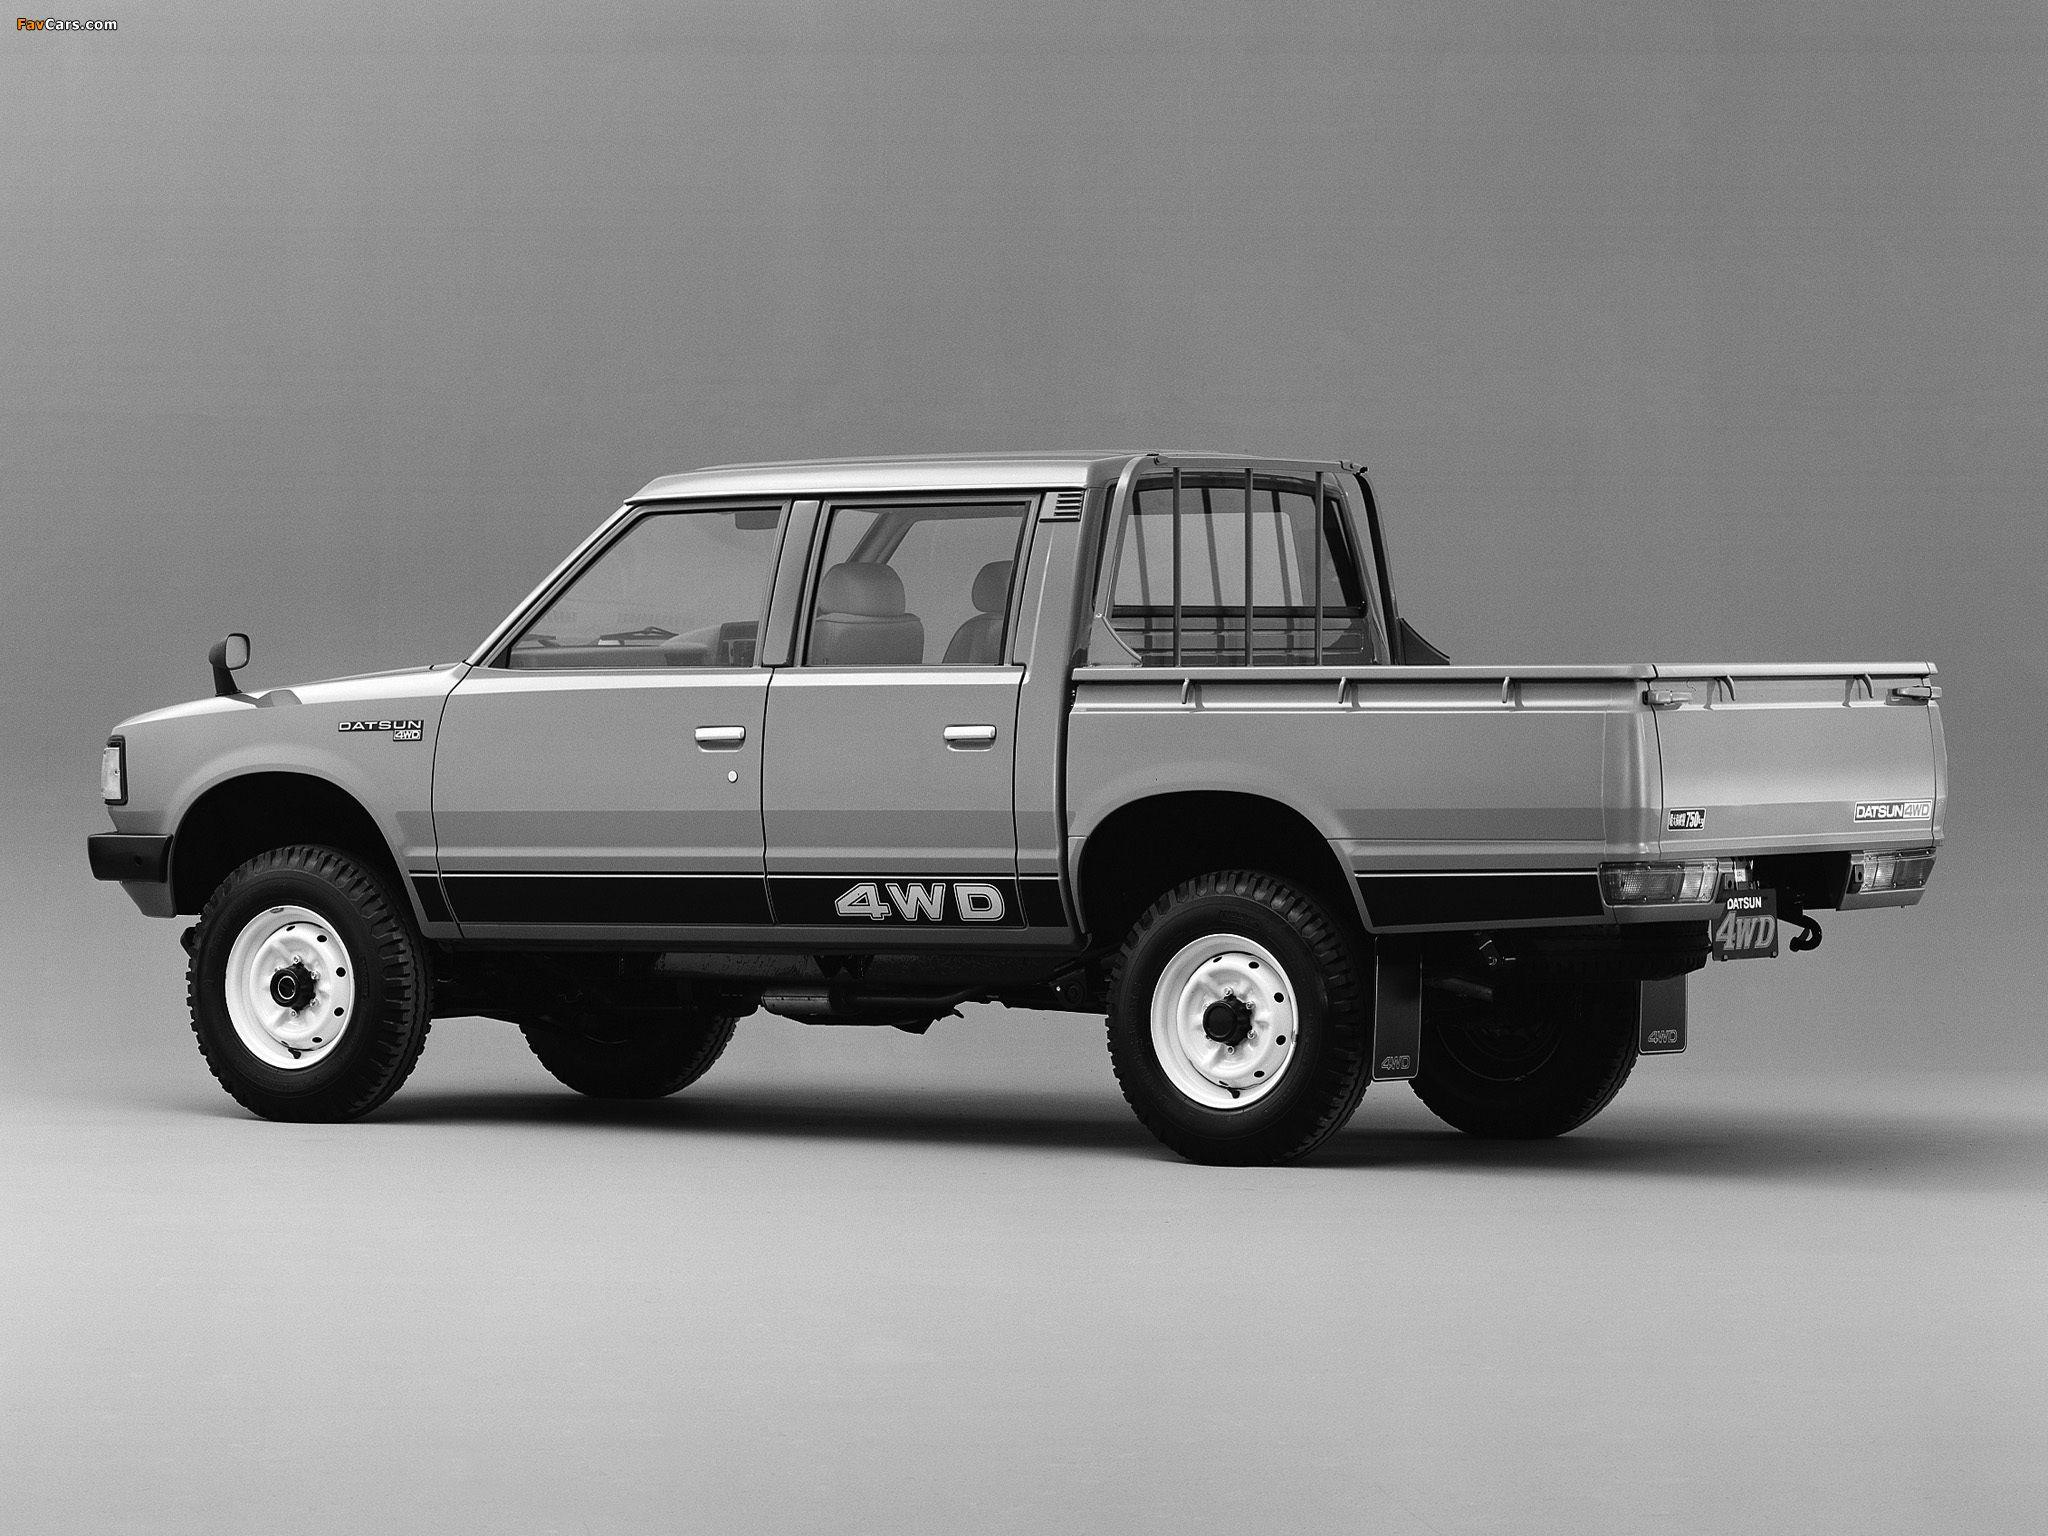 Cb D Ee Ad A A D B E E A on 1988 Dodge Dakota 4x4 Lifted